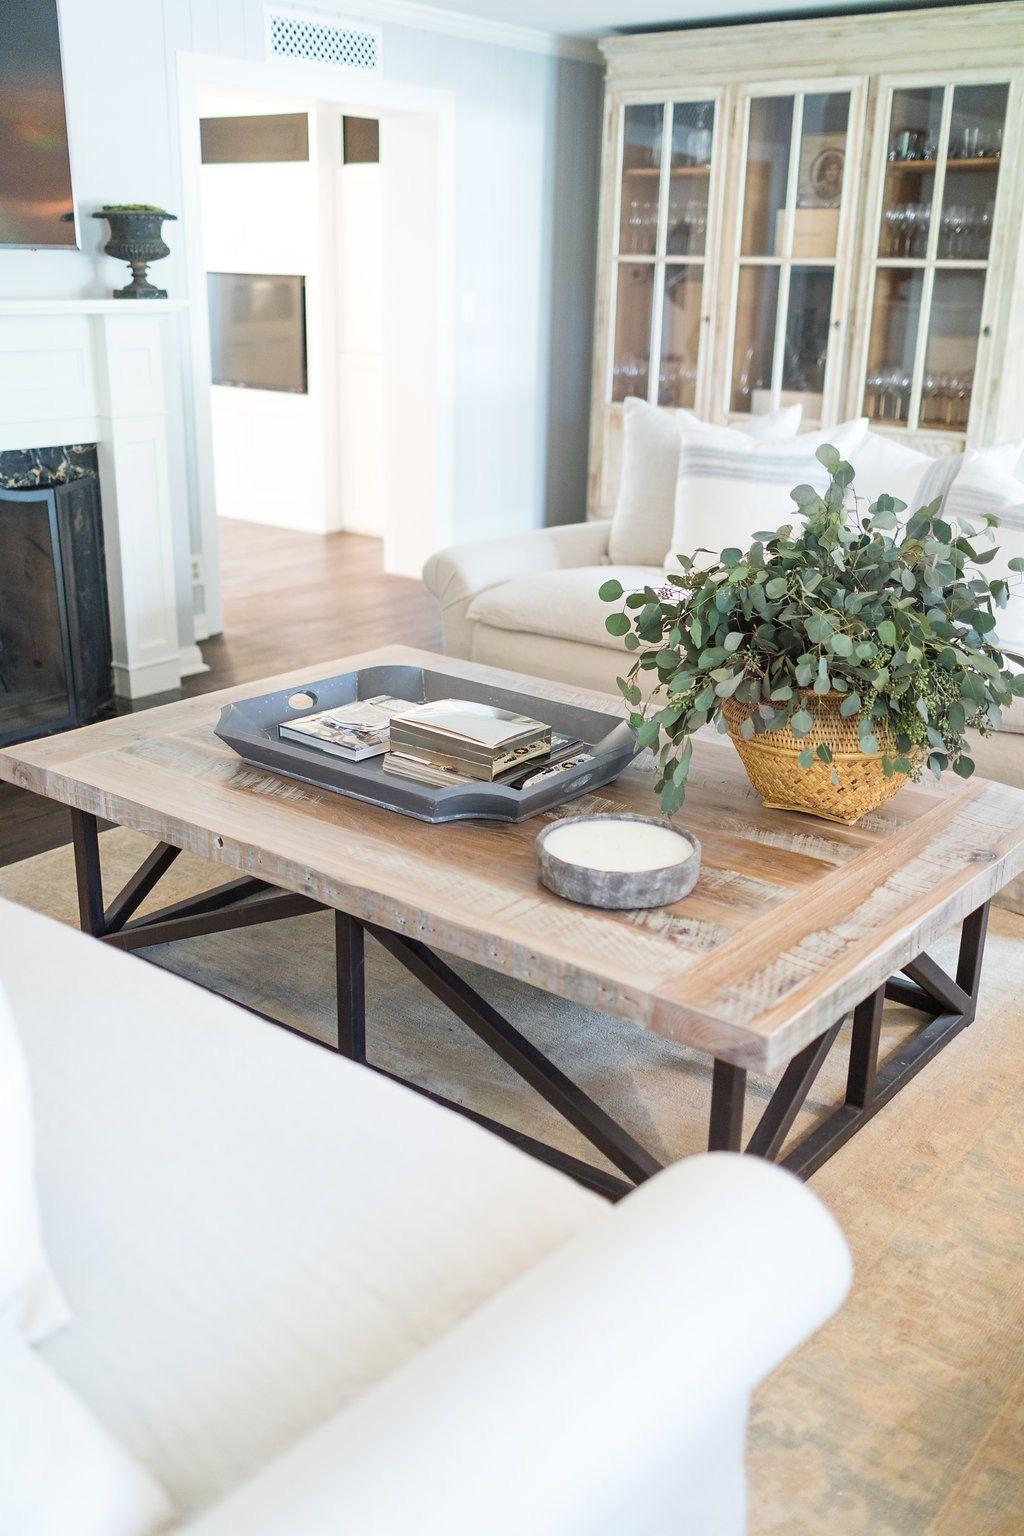 White Sofa Tricks Tv Decor Phoenix Homes Sofas Family Room Decorating